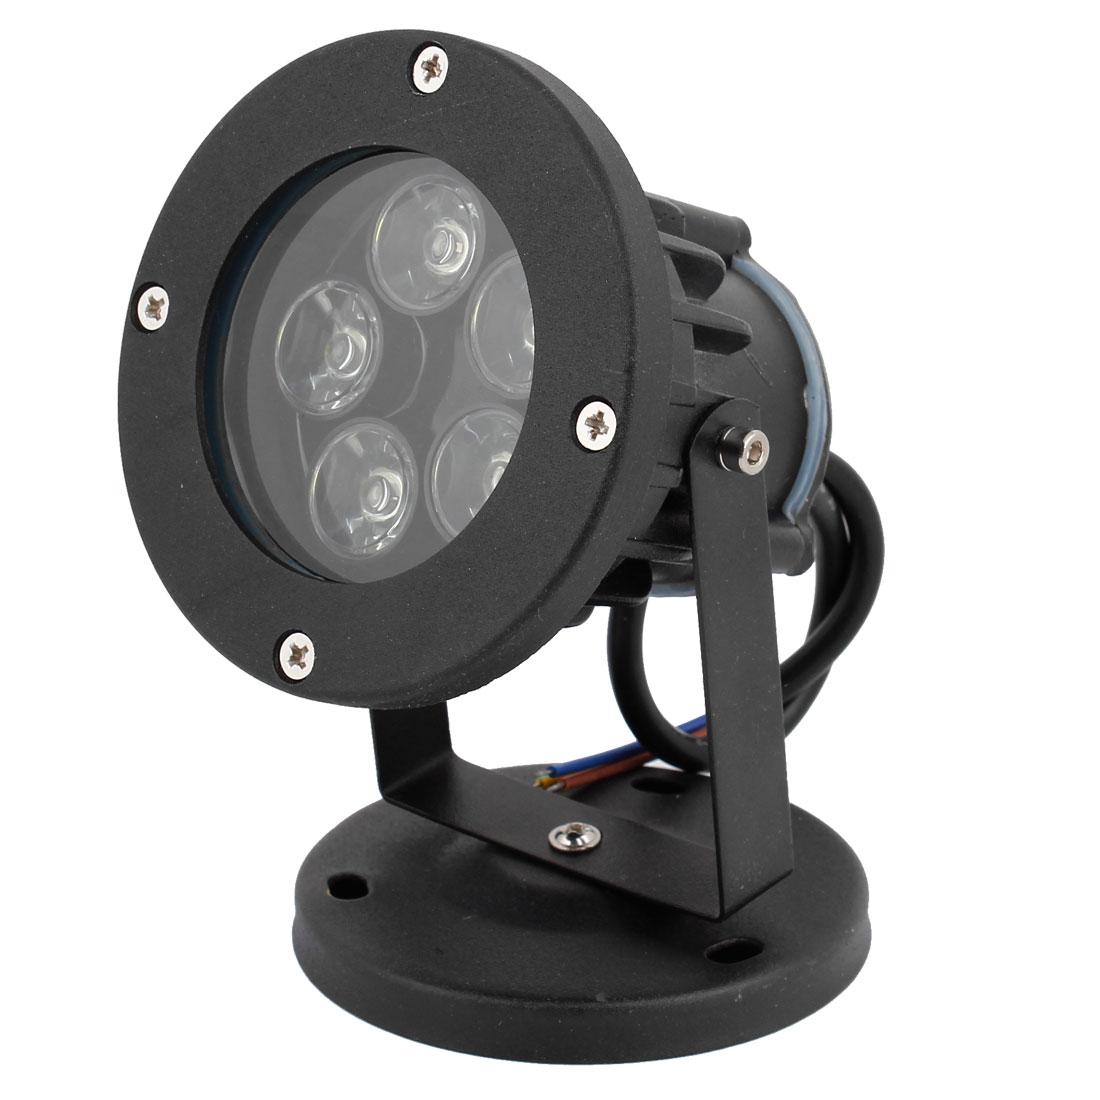 AC 85-265V 10W 500-550lm 5 LEDs White Light Path Garden Spotlight Bulb